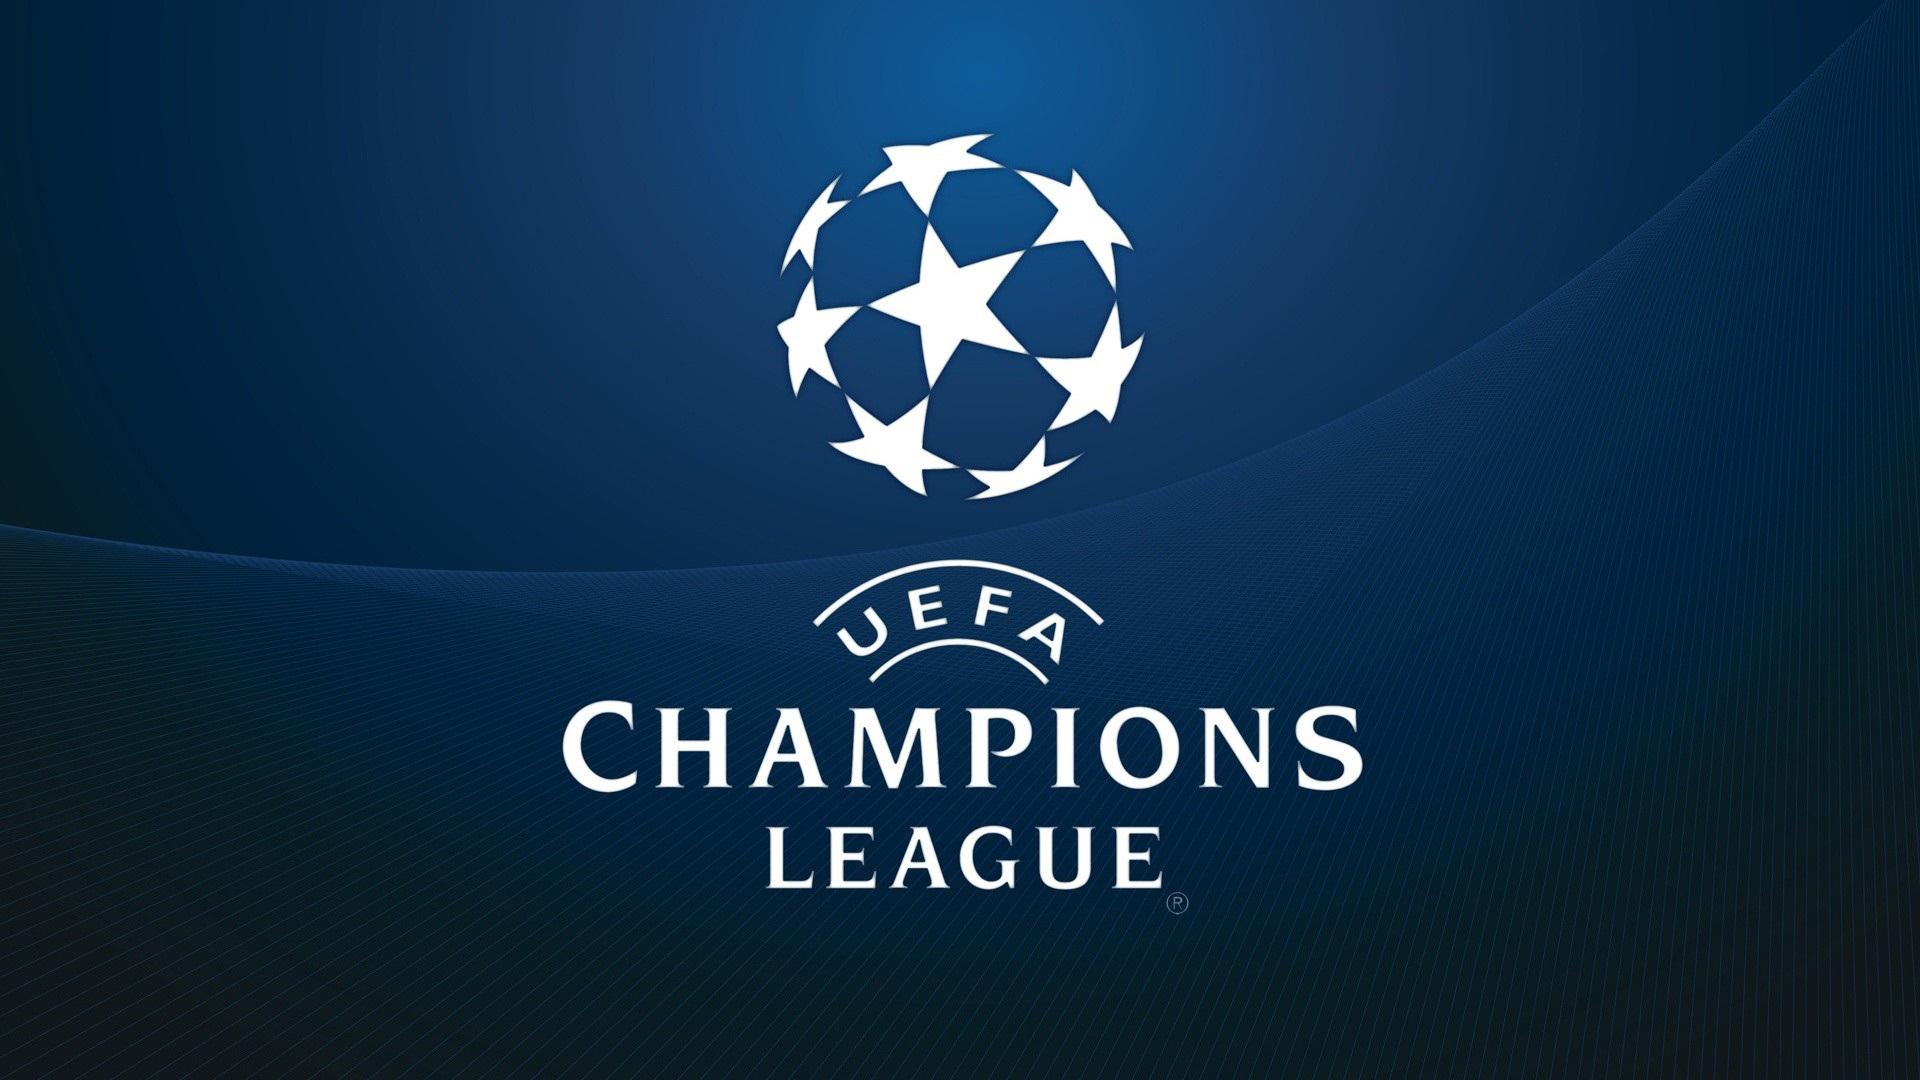 curiosidades sobre a champions league logocuriosidades sobre a champions league logo